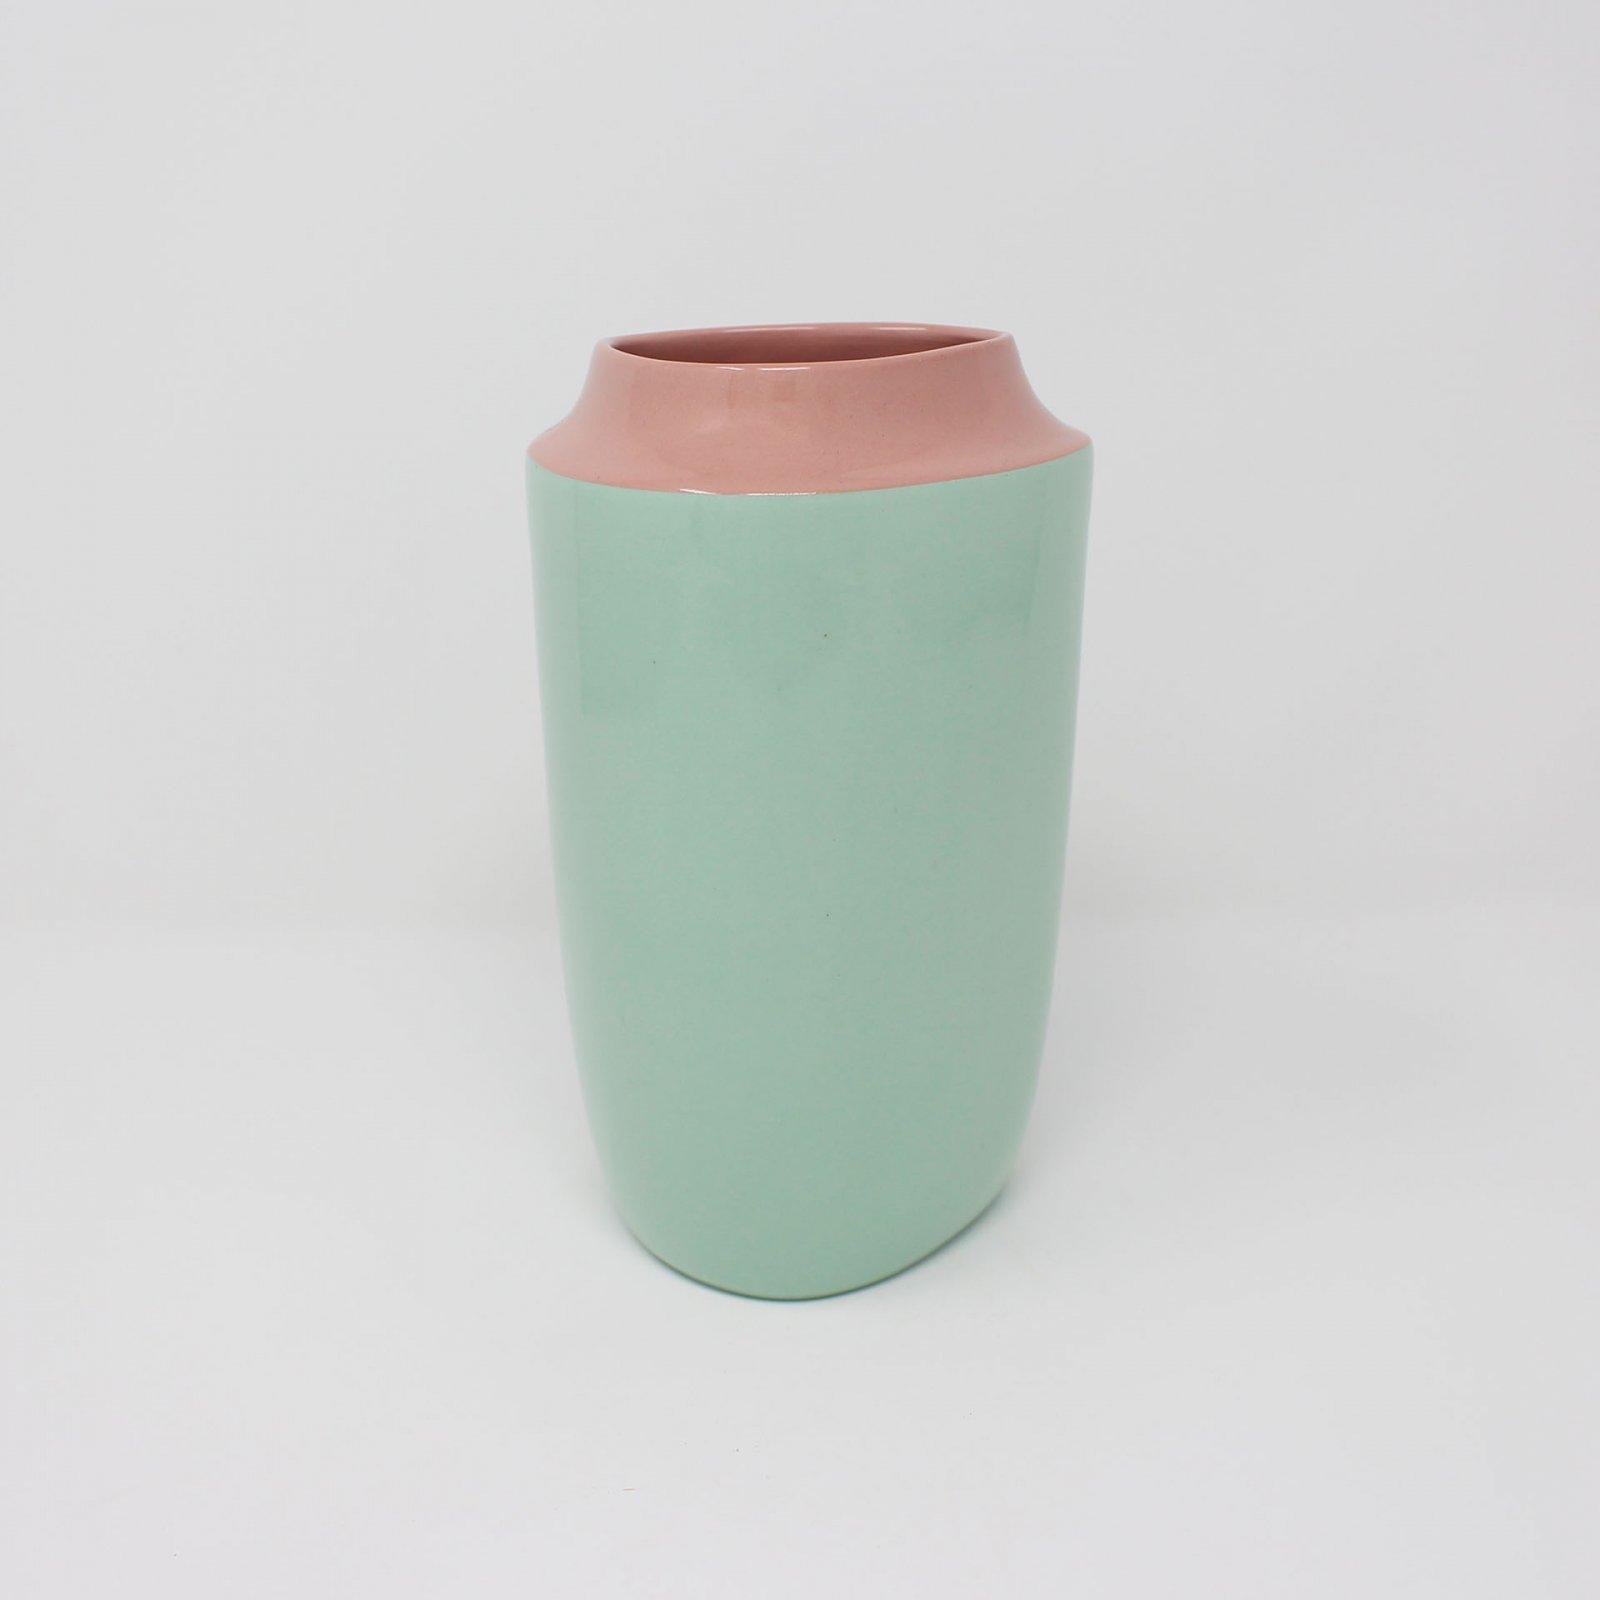 Top Curve Vase